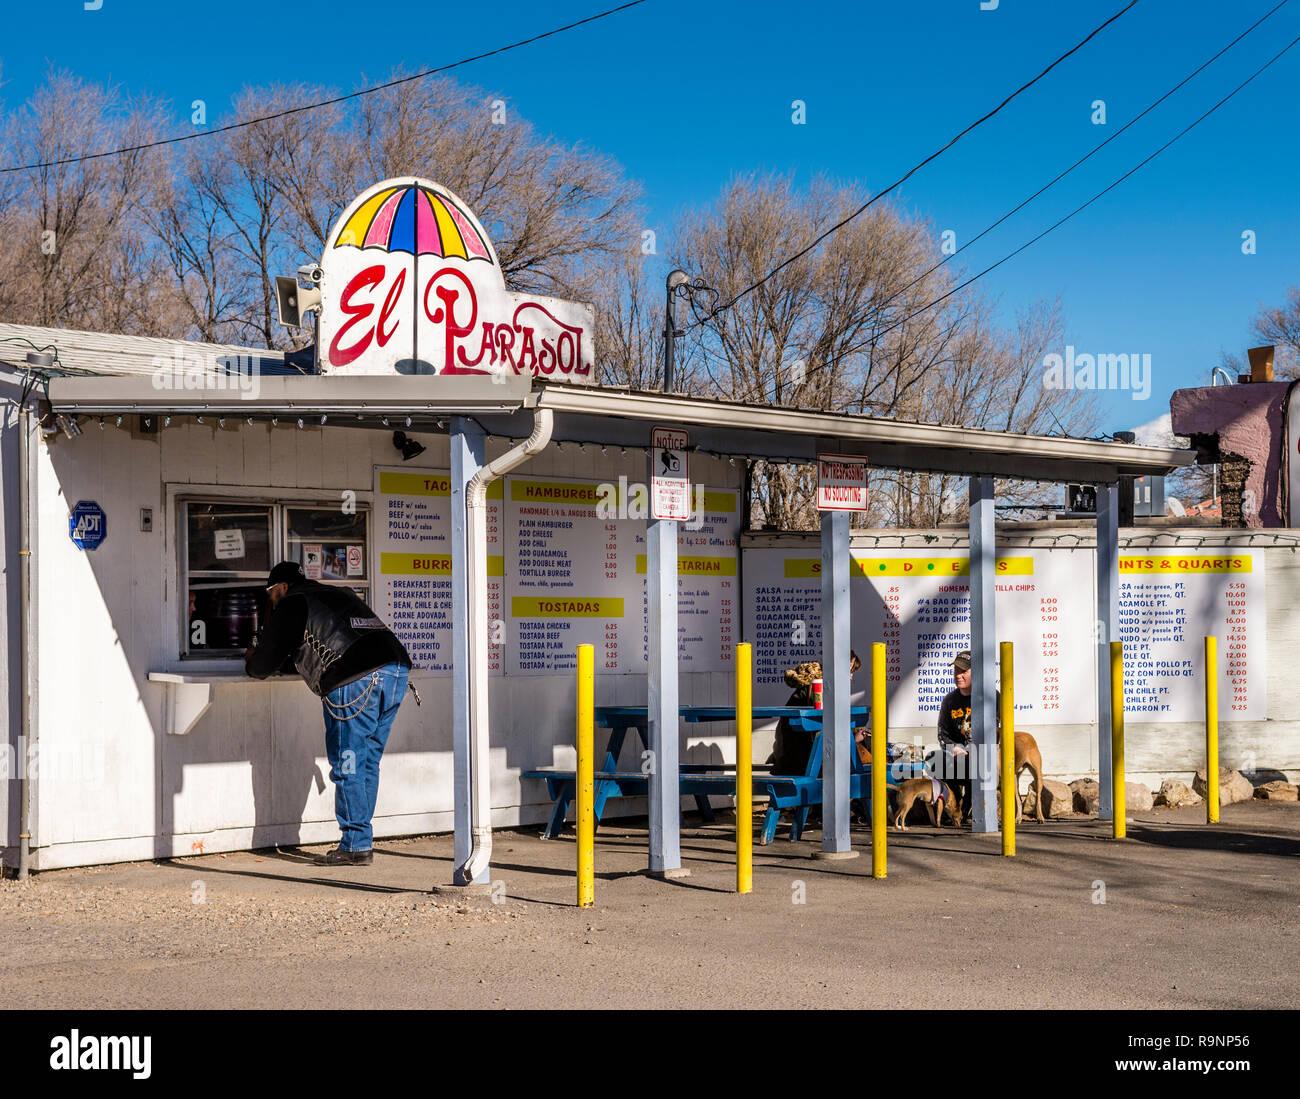 Espanola New Mexico Usa El Parasol Restaurant Stock Photo Alamy